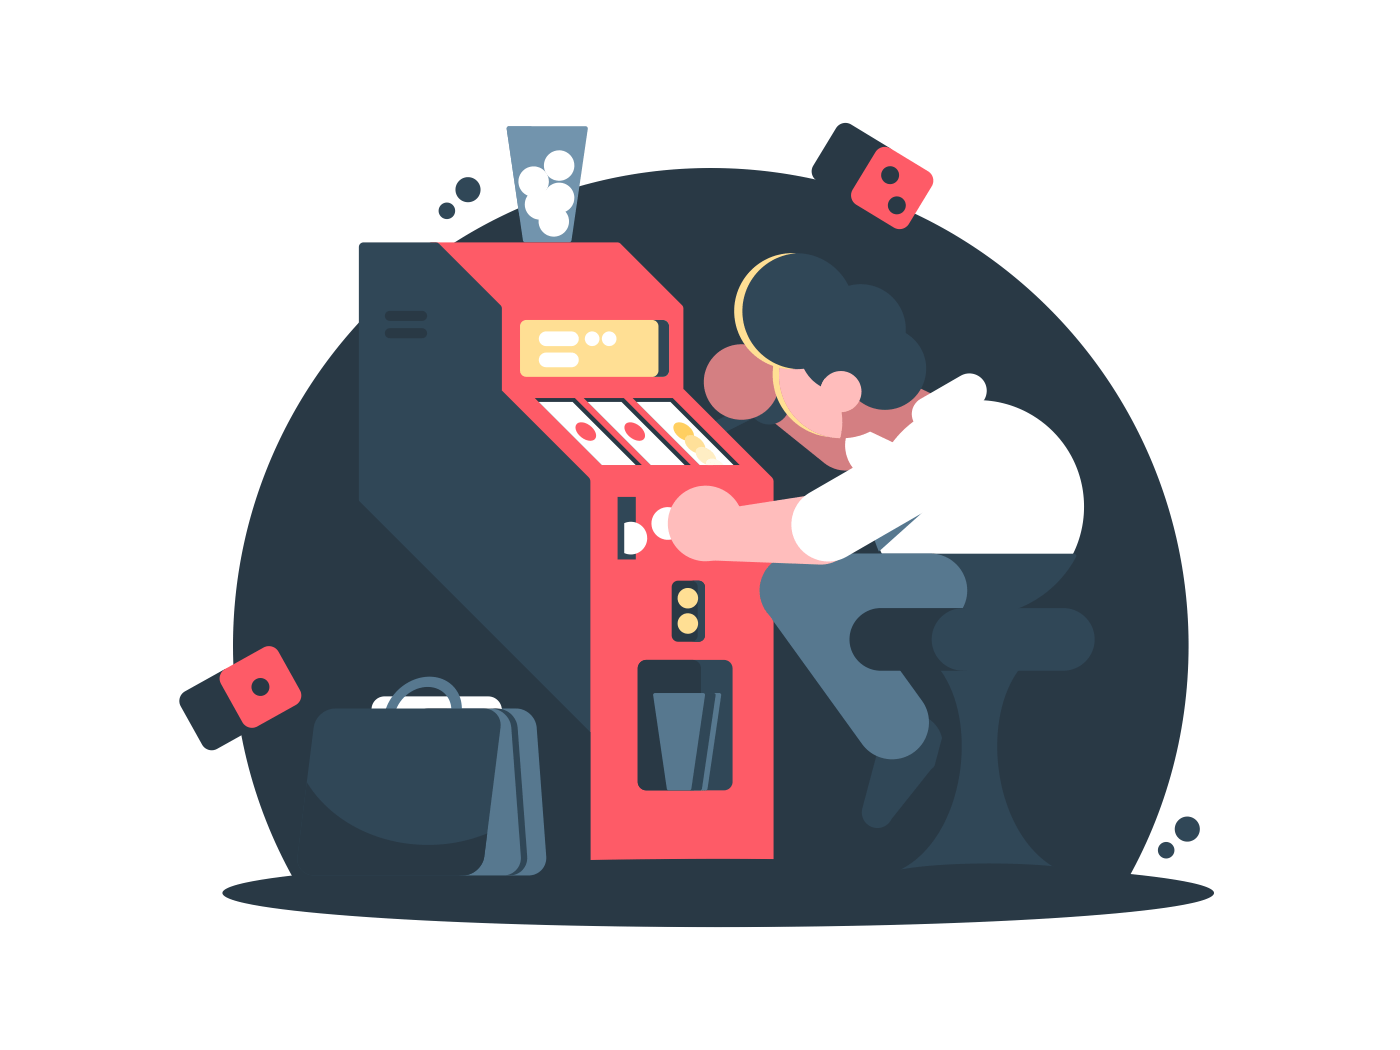 Man plays slot machine in casino. Gambling addiction, vector illustration